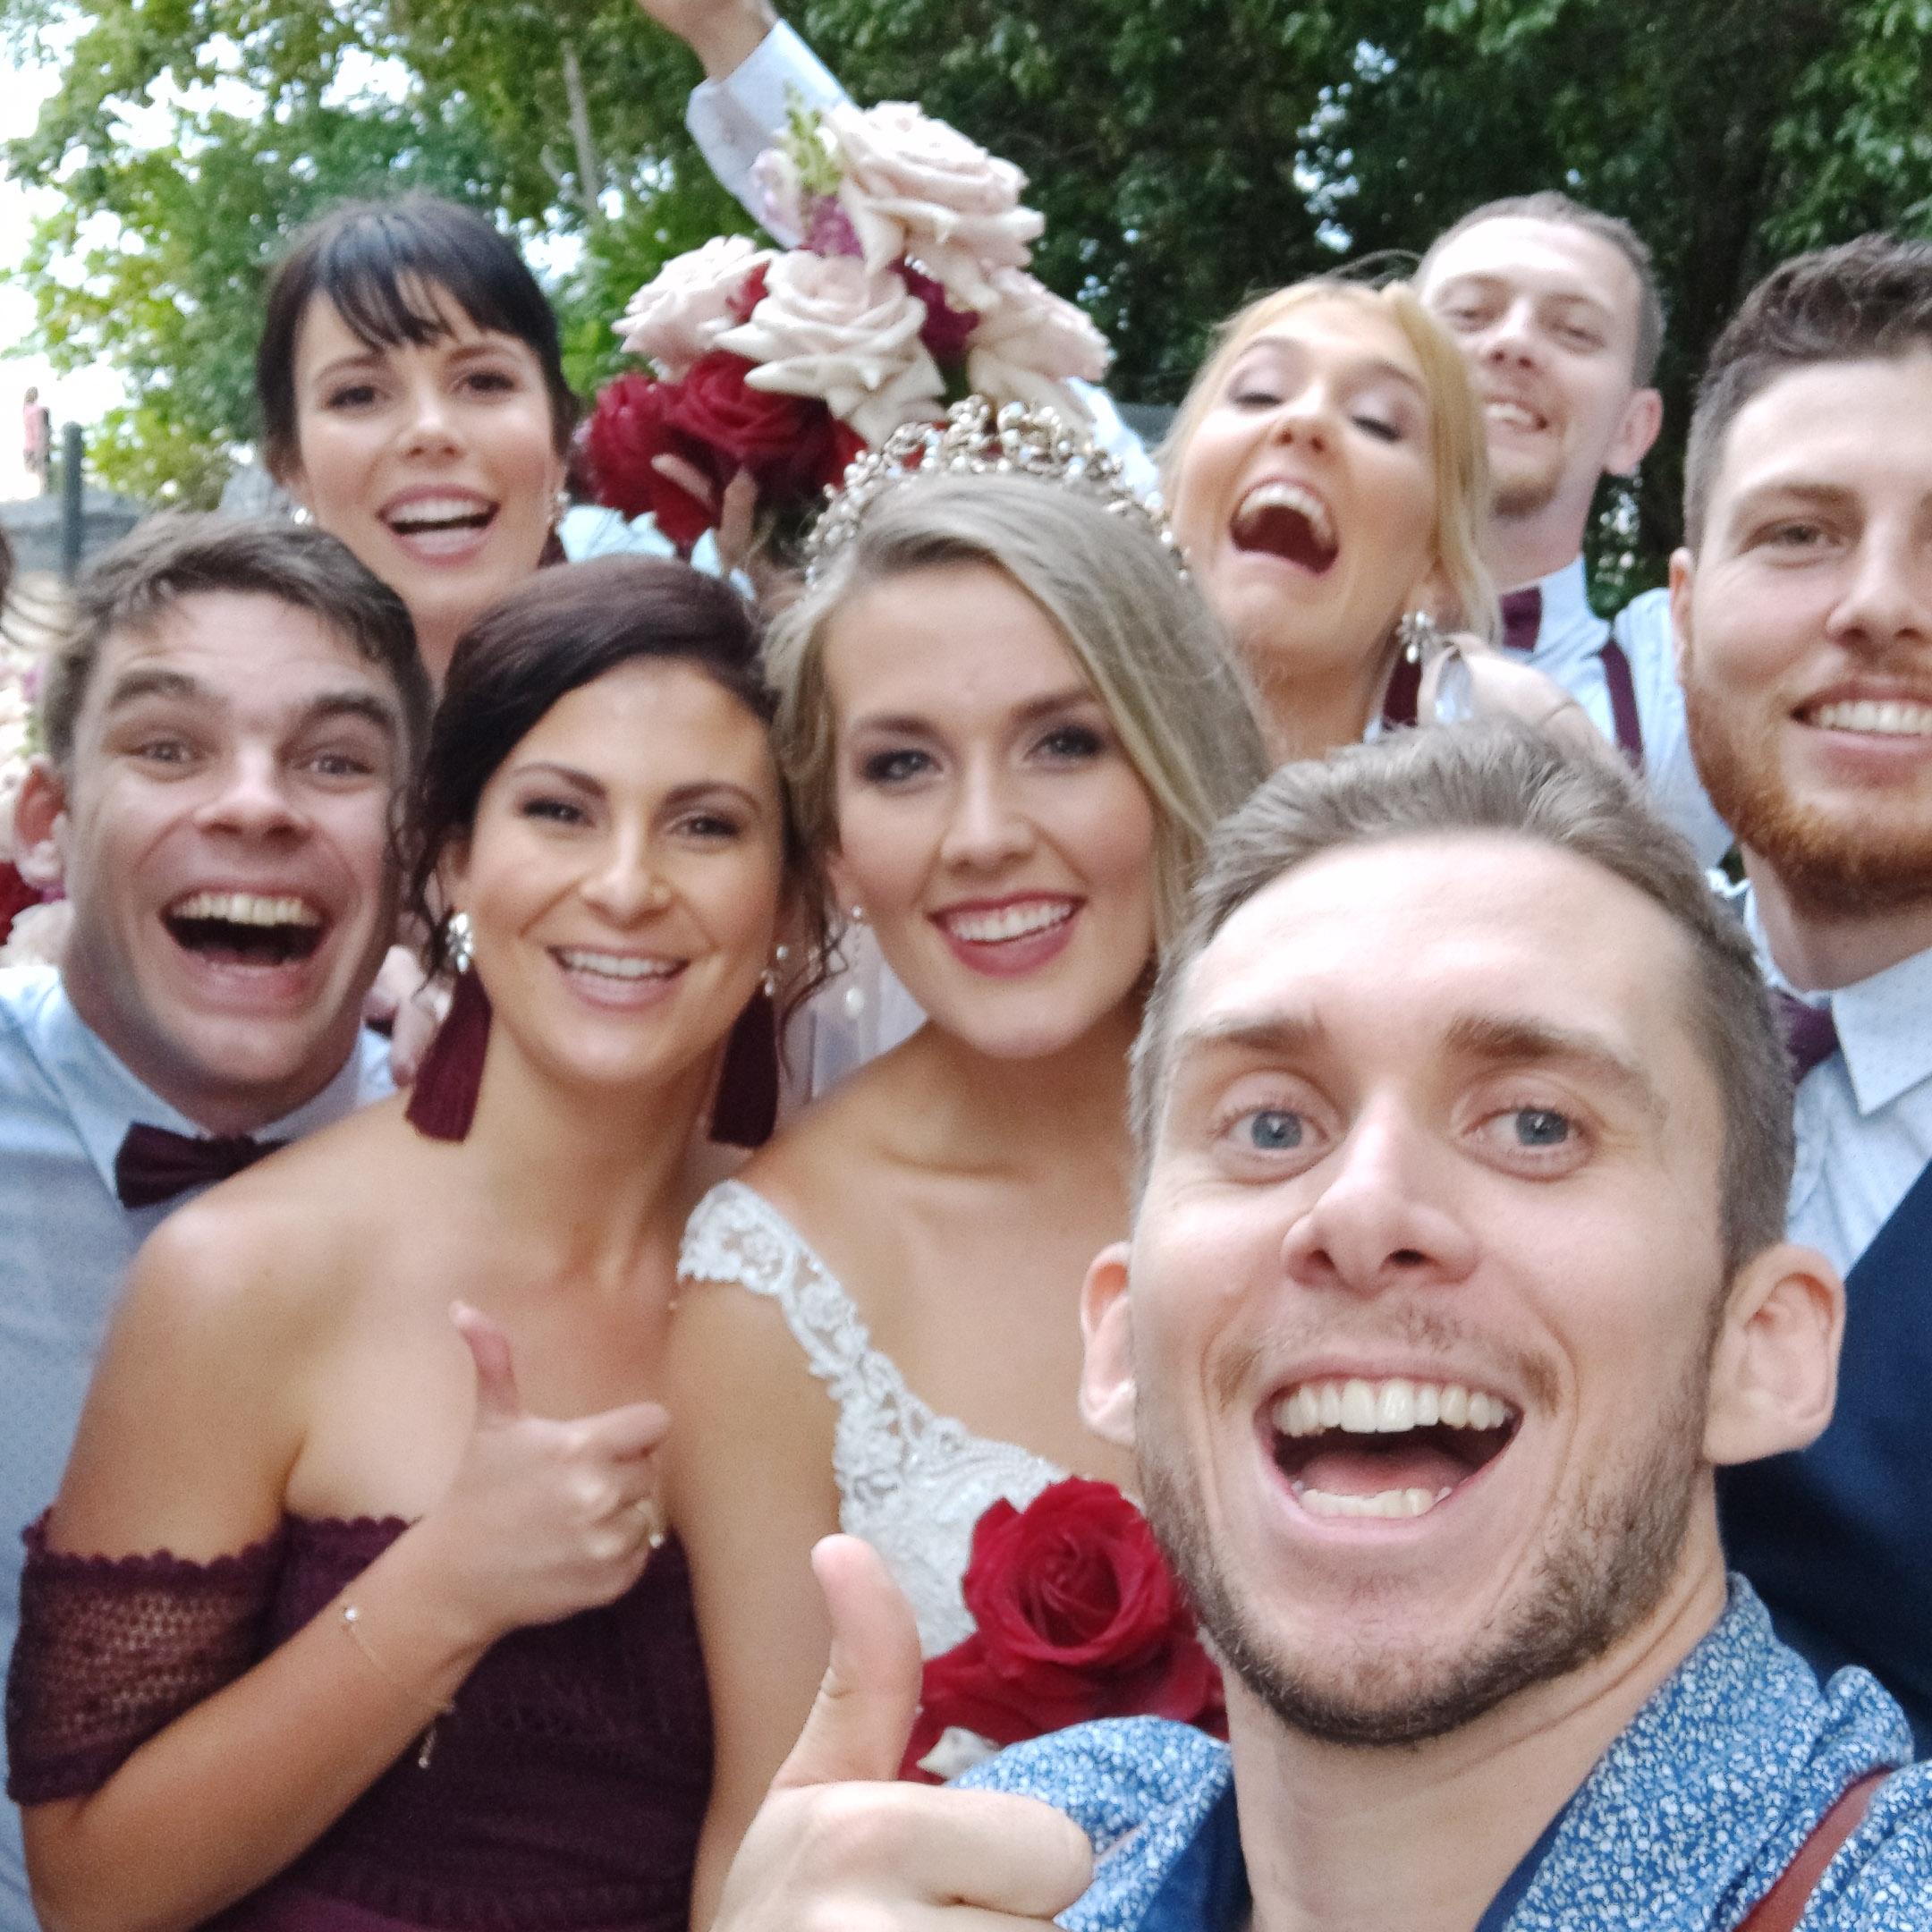 The-raw-photographer-cairns-wedding-photography-bridalparty-selfie-9.jpg